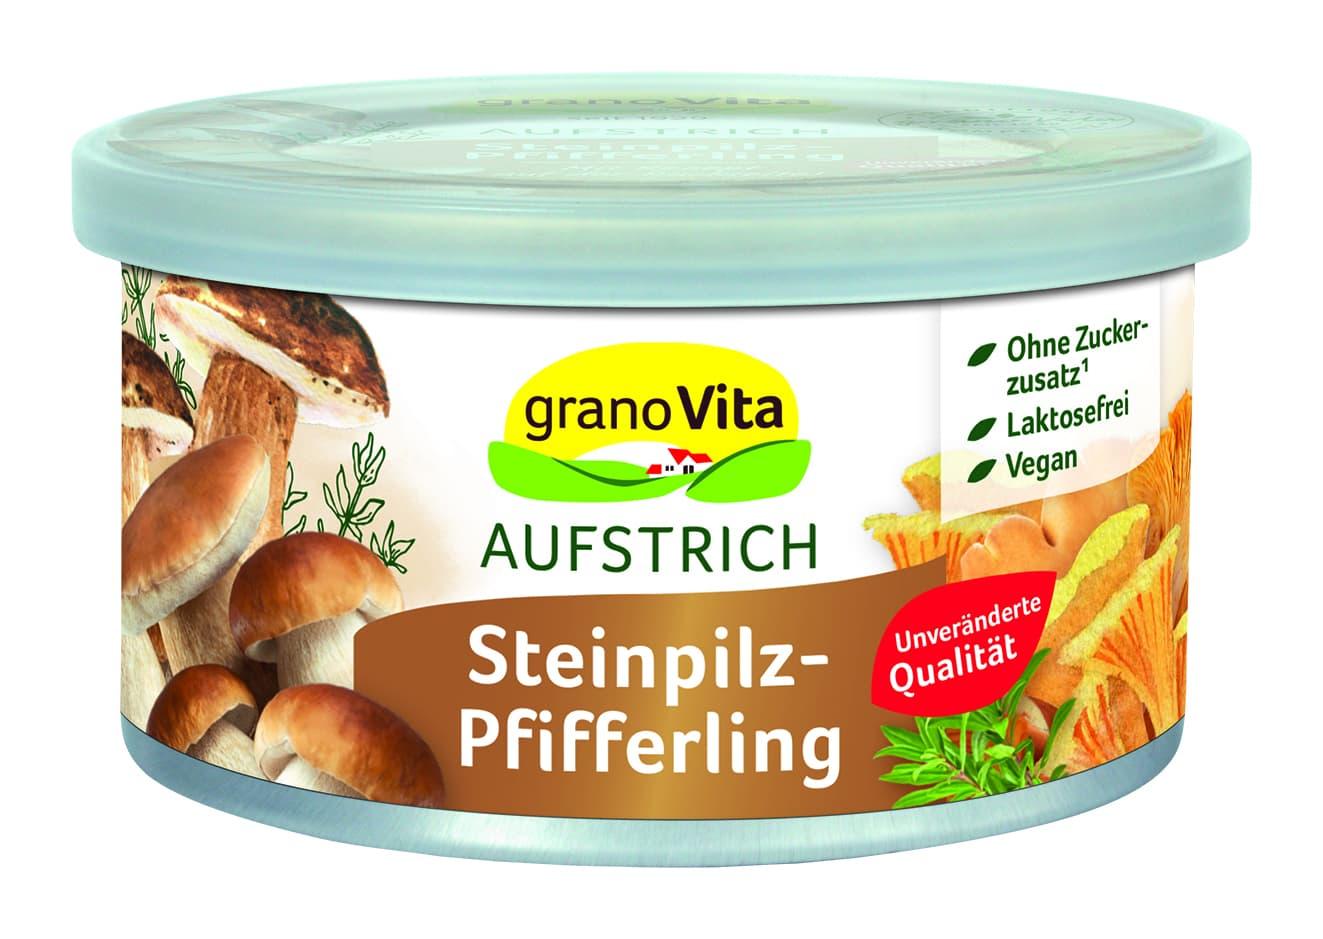 GranoVita - Steinpilz-Pfifferling 125g